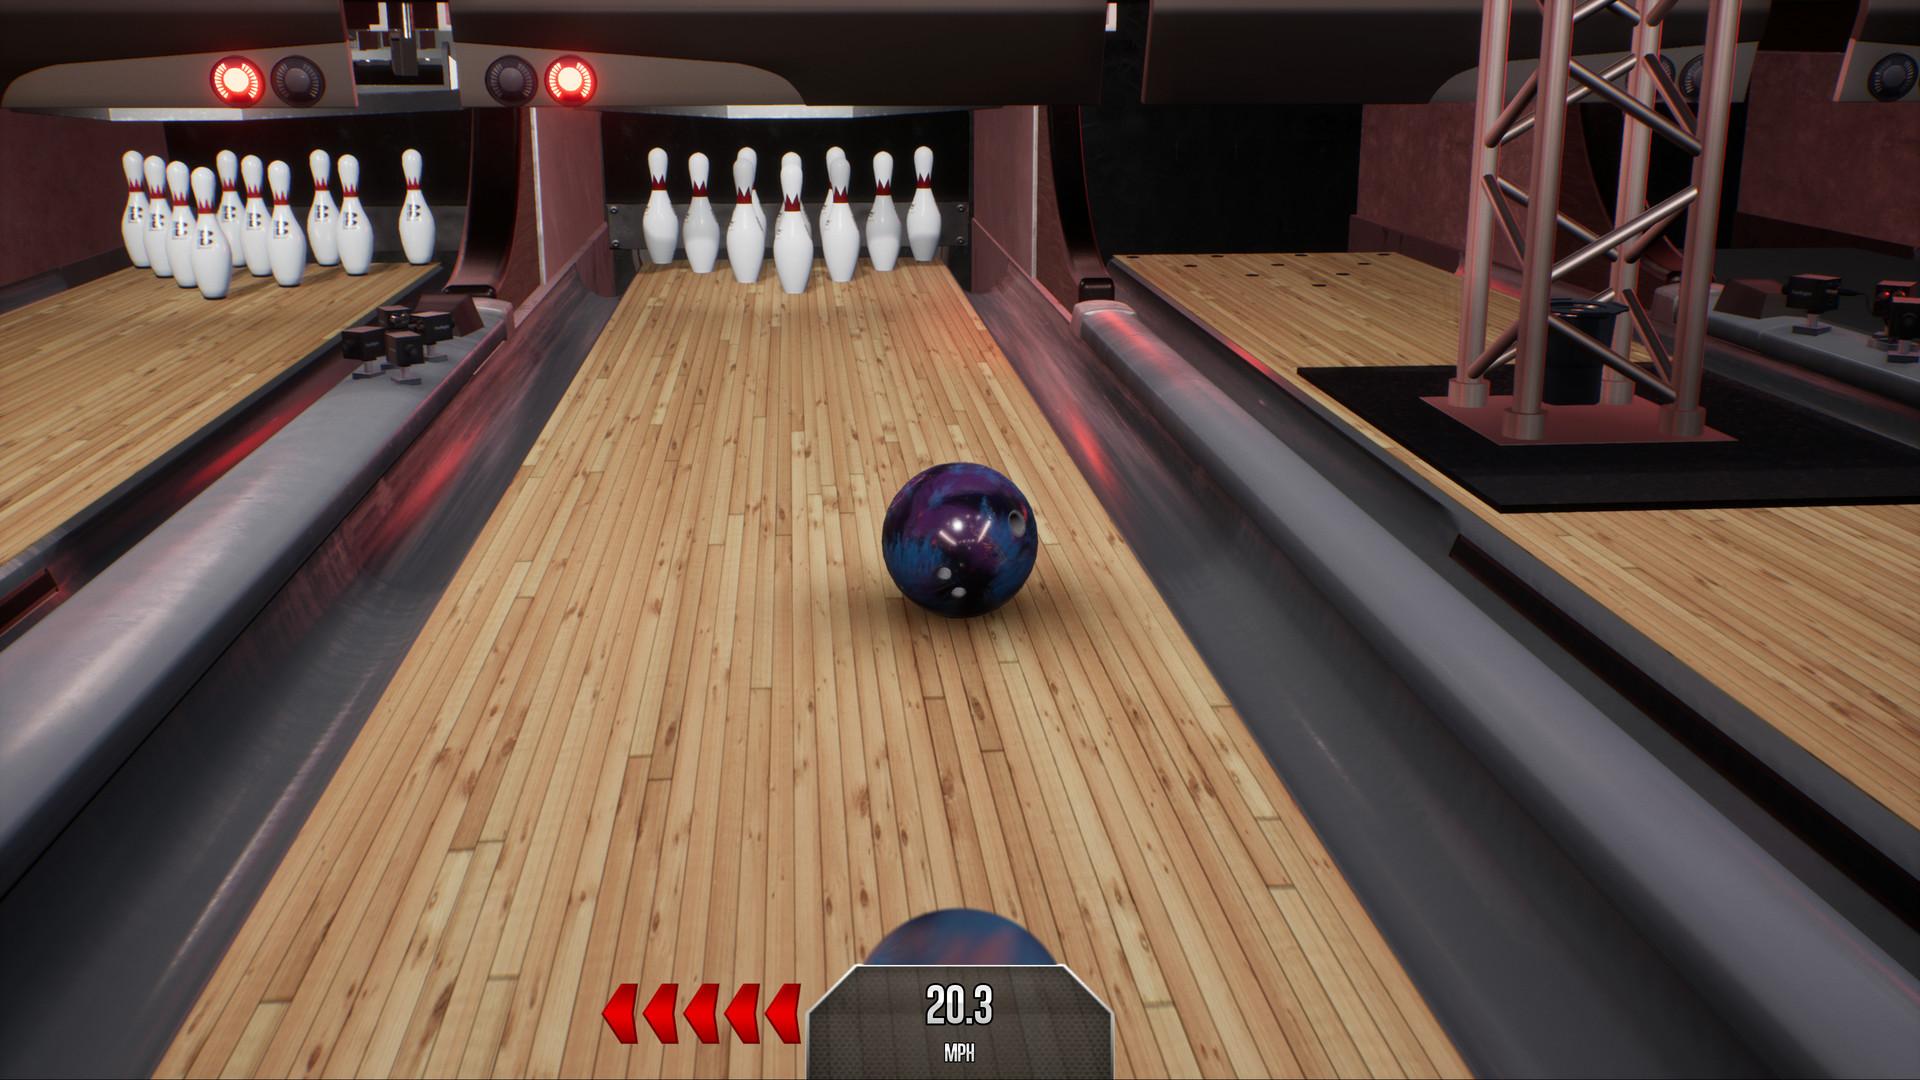 pba-pro-bowling-2021-pc-screenshot-02